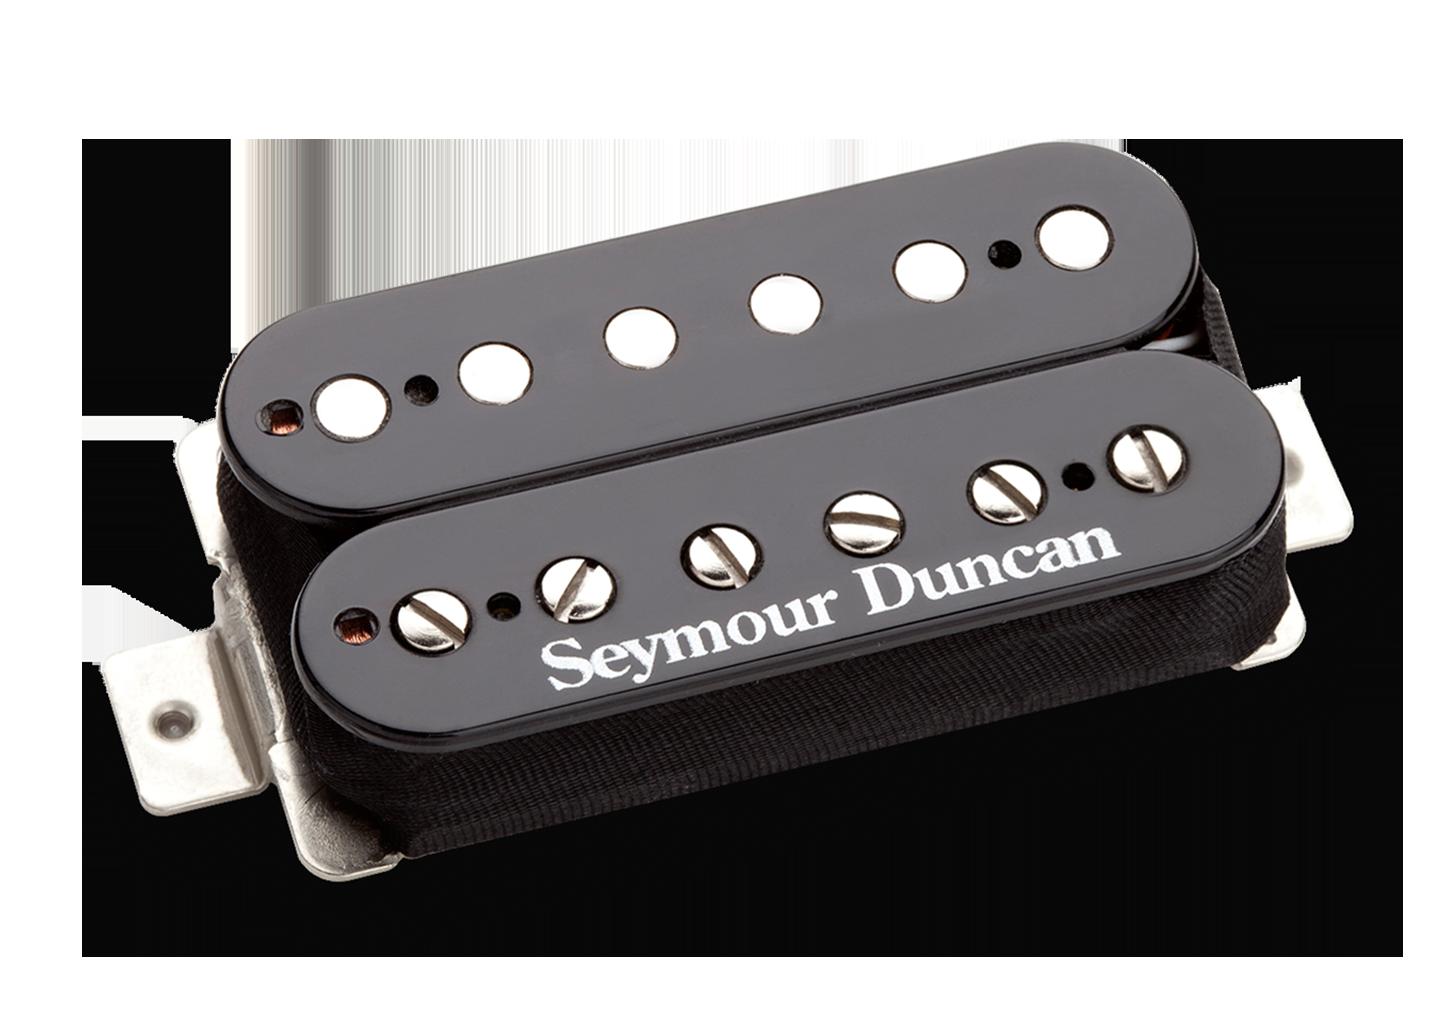 Seymour Duncan JB Humbucker - SH-4 Black